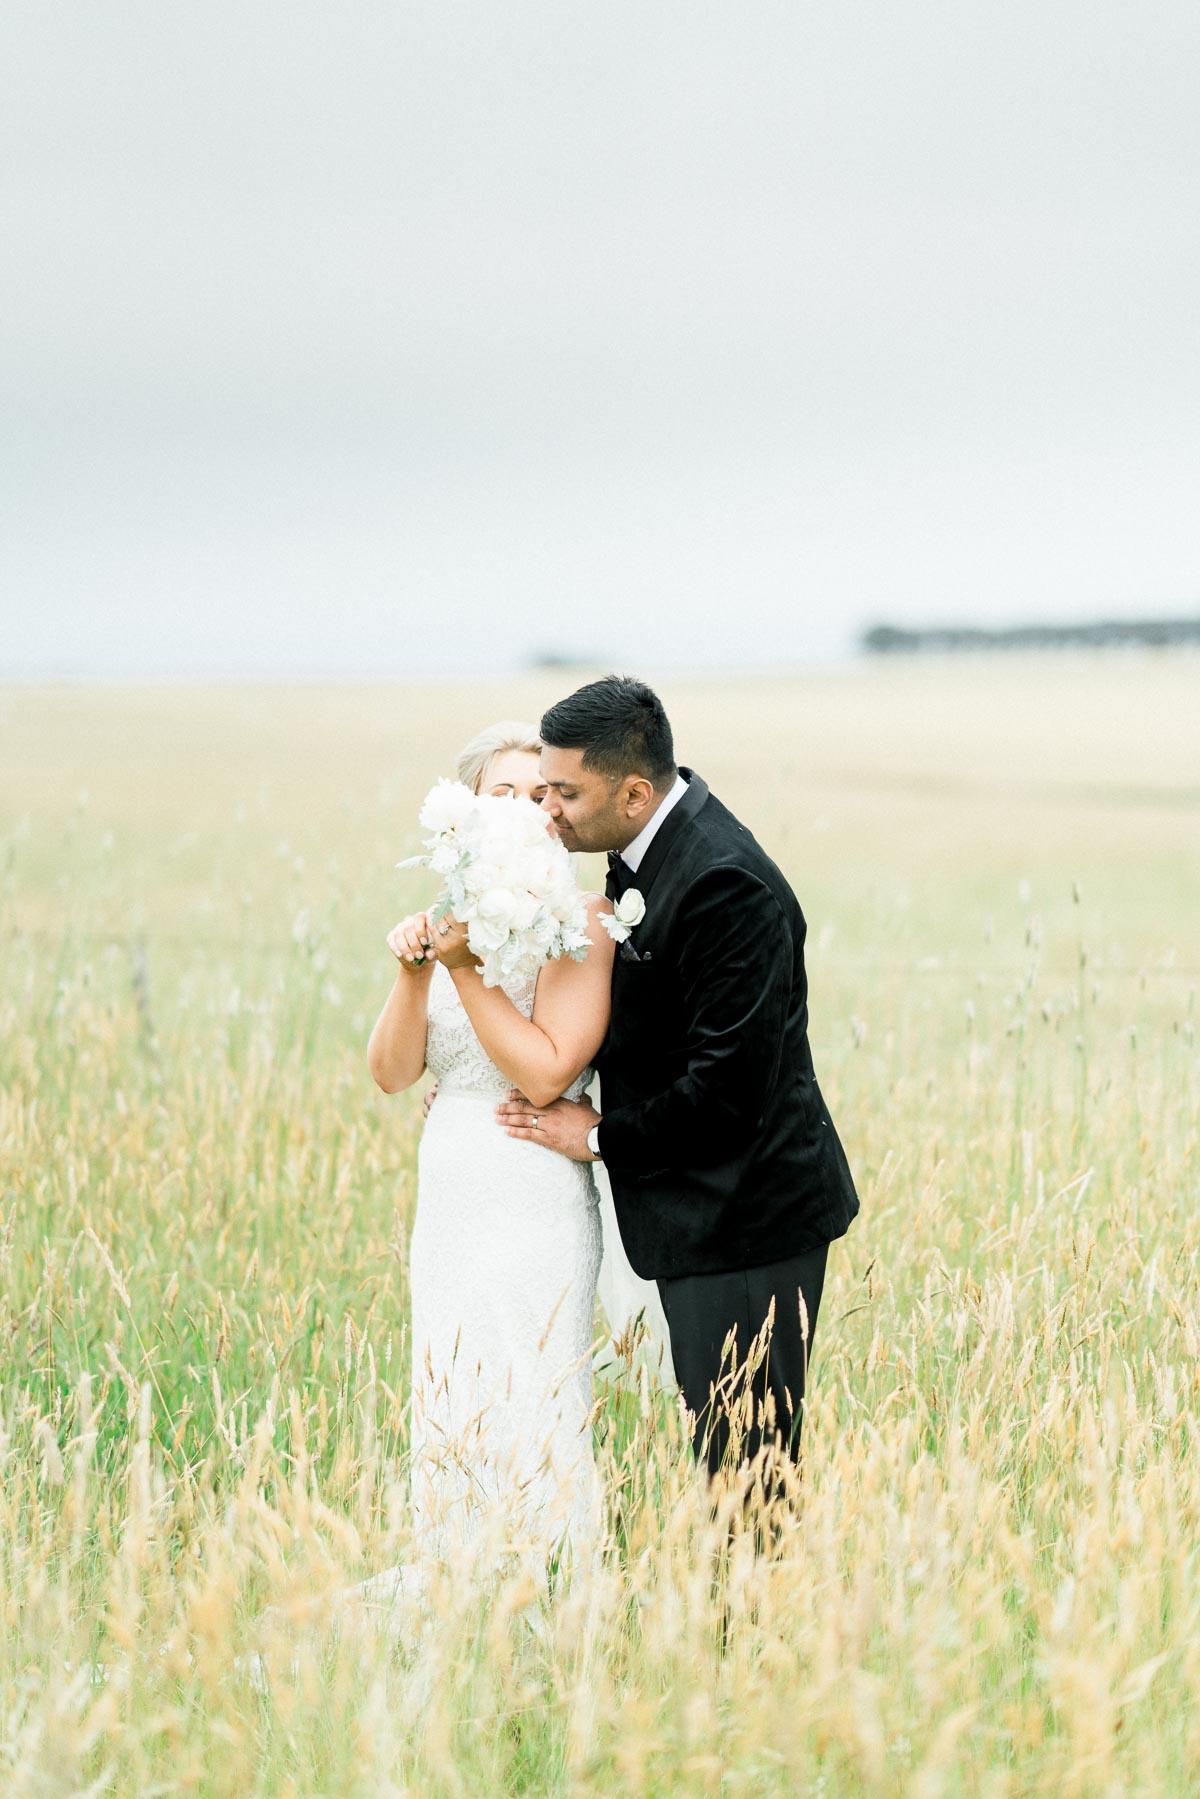 trenavin-chapel-phillip-island-wedding-heart+soul-weddings-sally-sean-01642.jpg